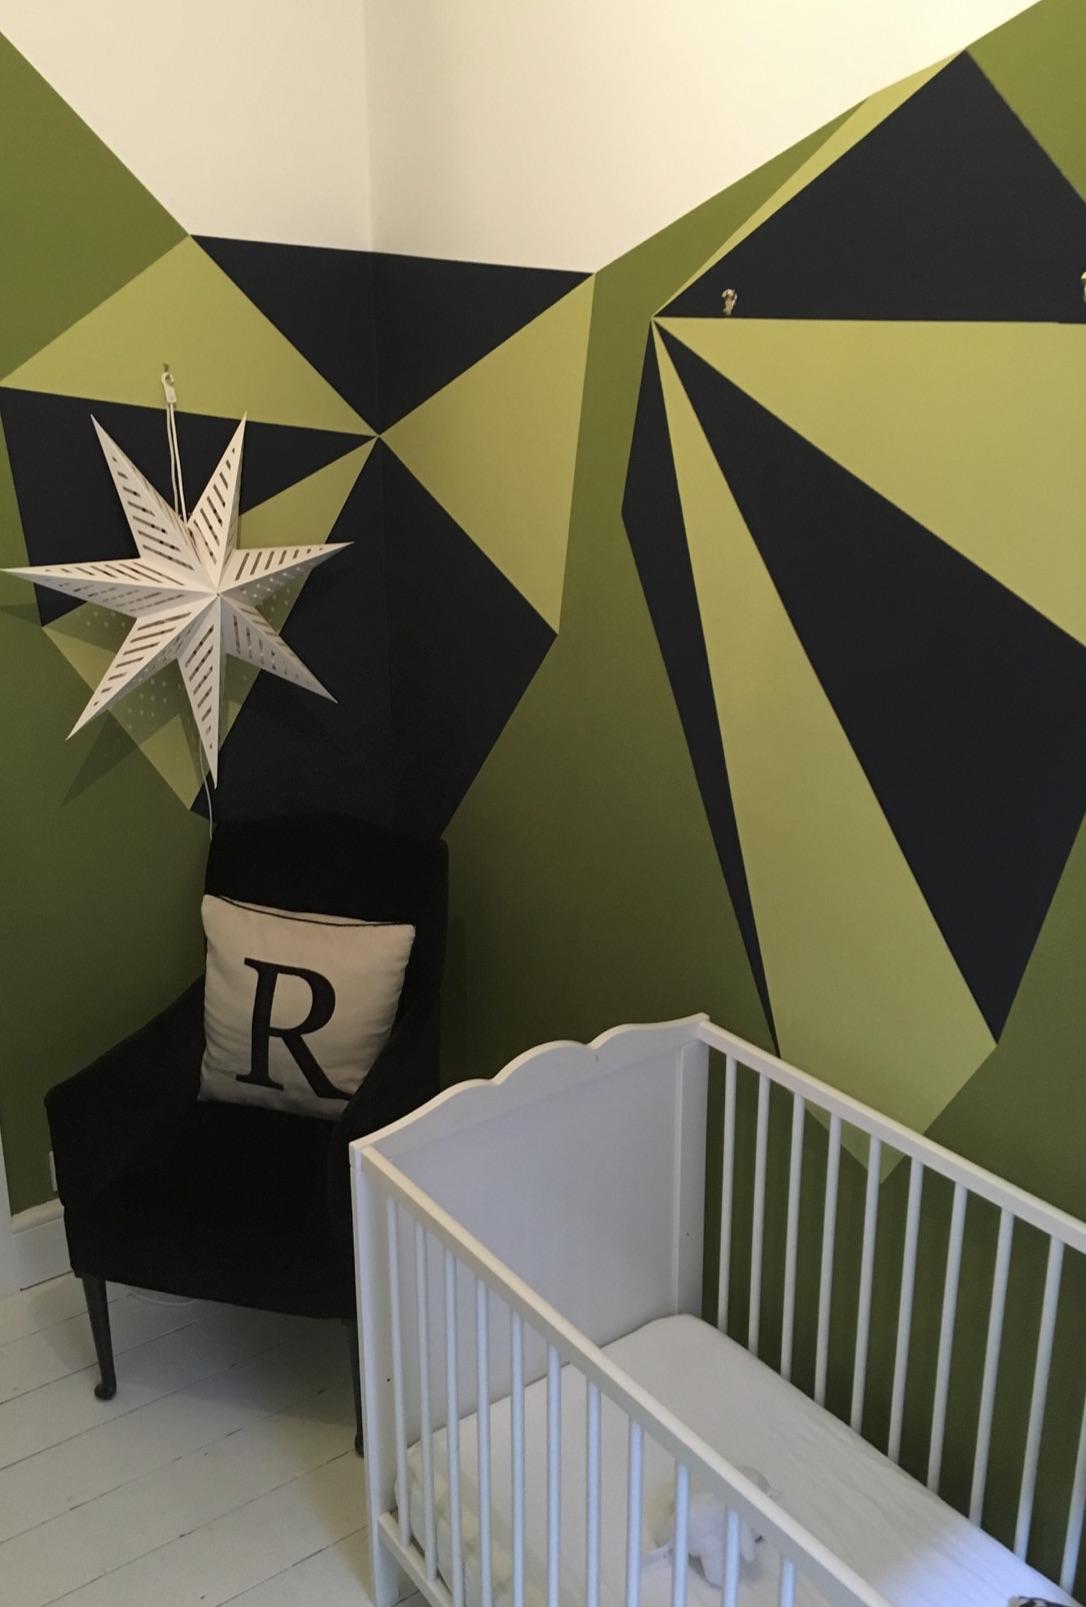 Rocco's Room